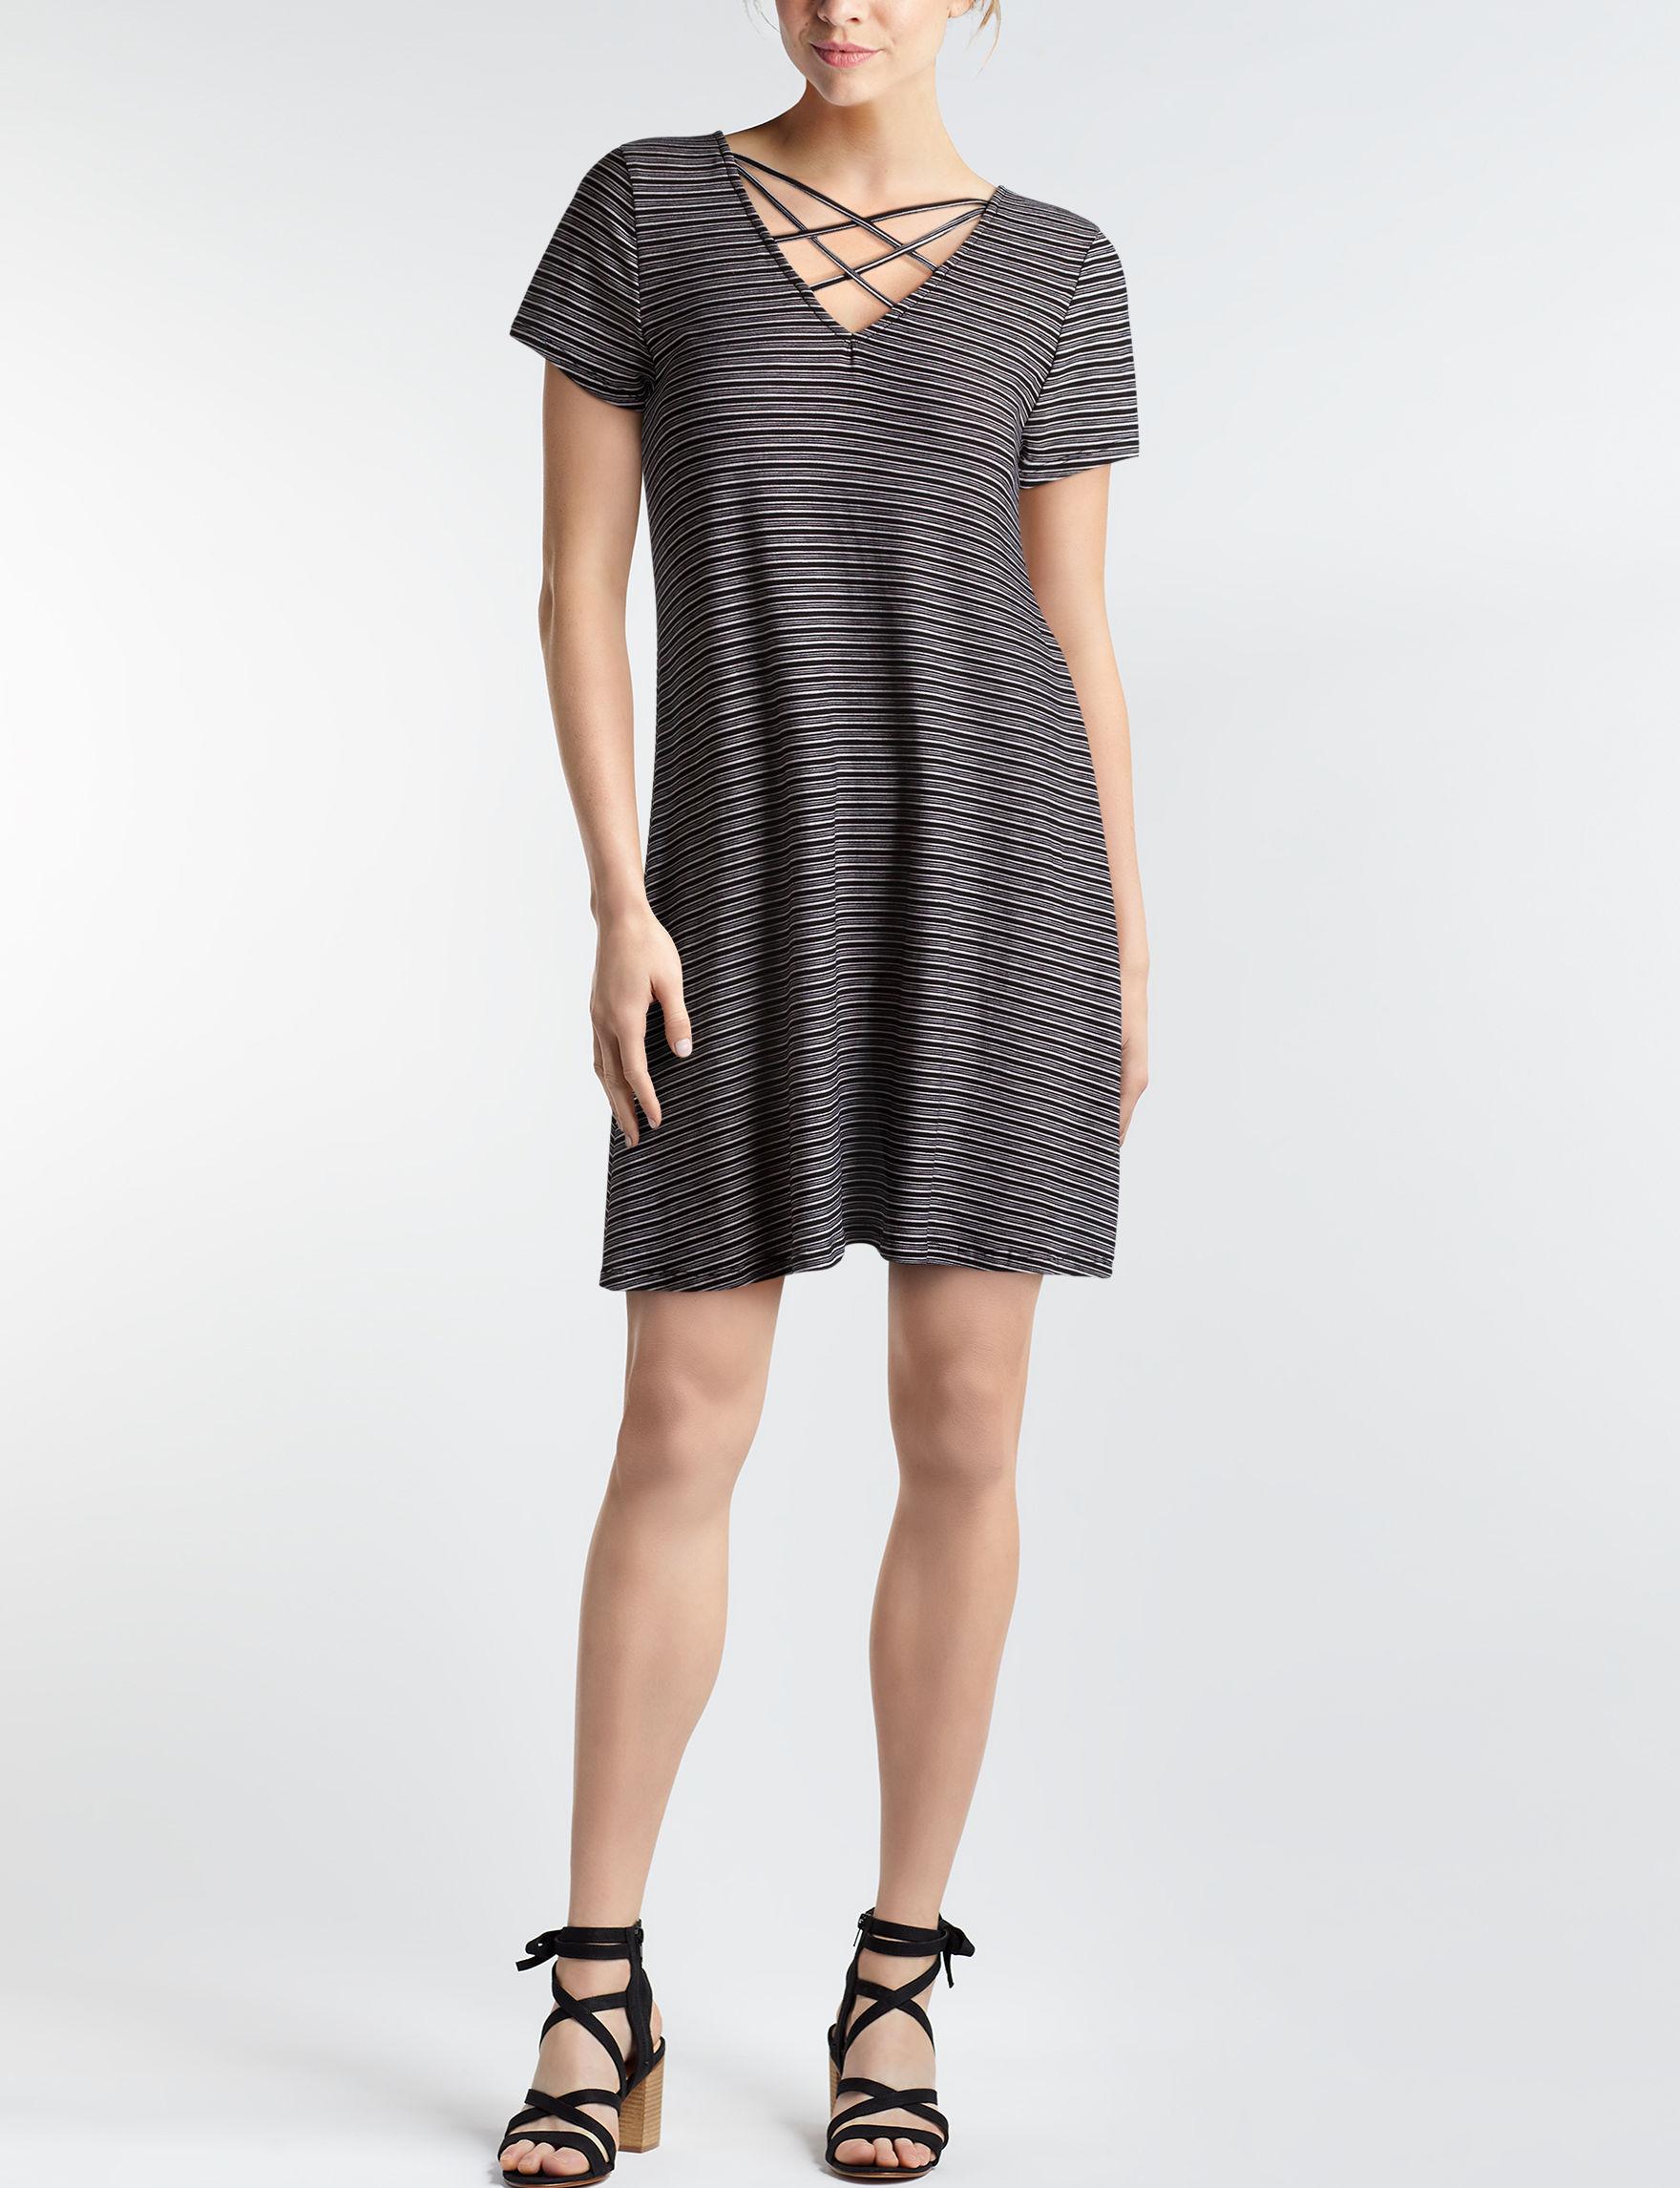 Wishful Park Black / White Everyday & Casual Shift Dresses